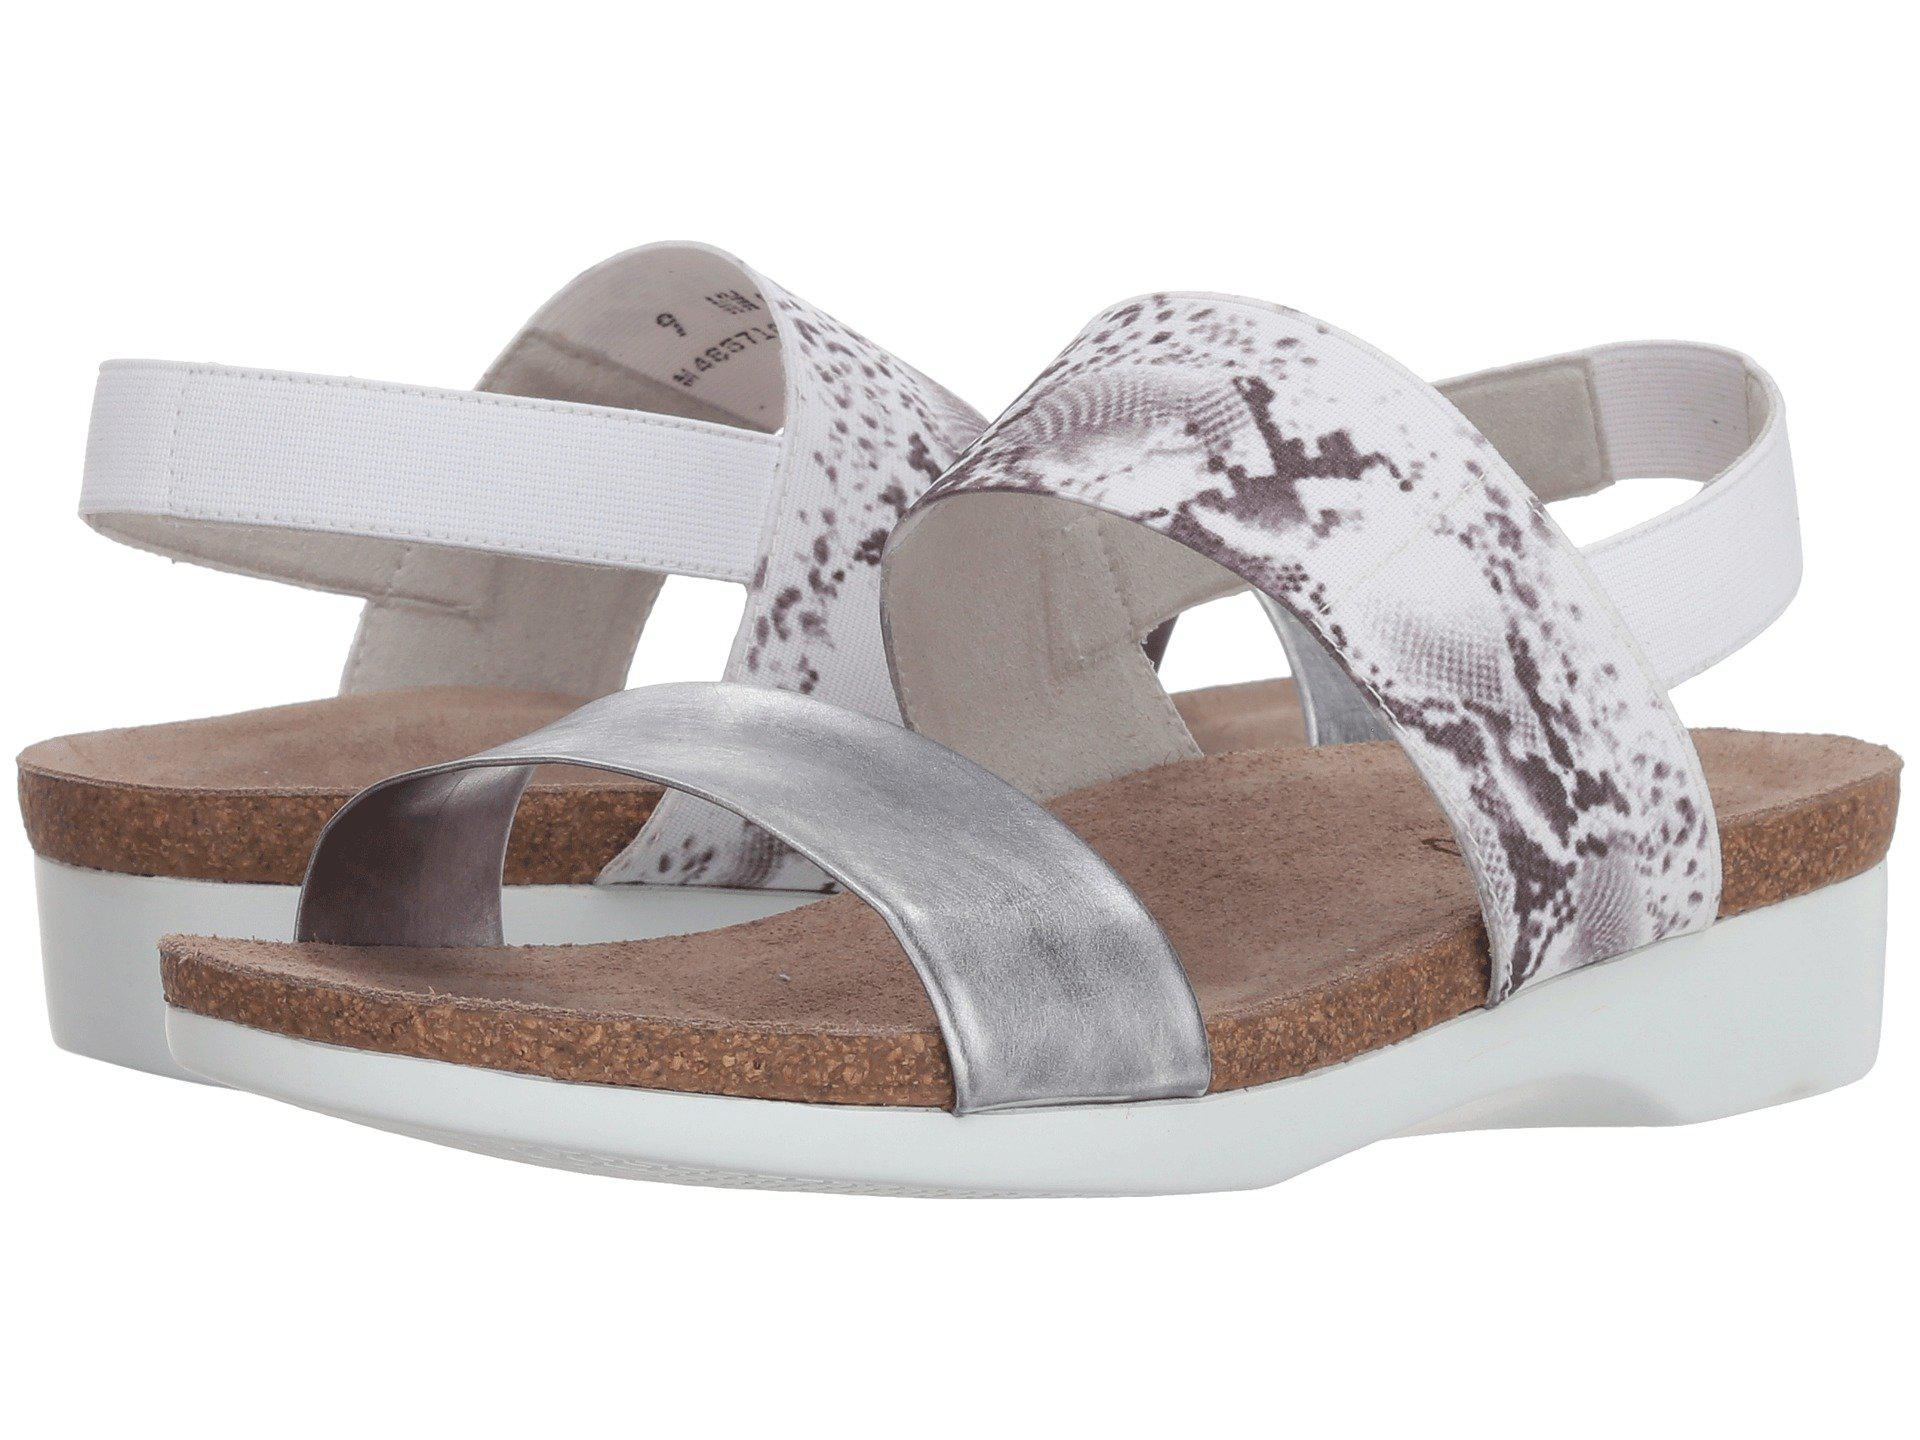 99a6c43e2 Lyst - Munro Pisces (white/black Fabric Combo) Women's Sandals